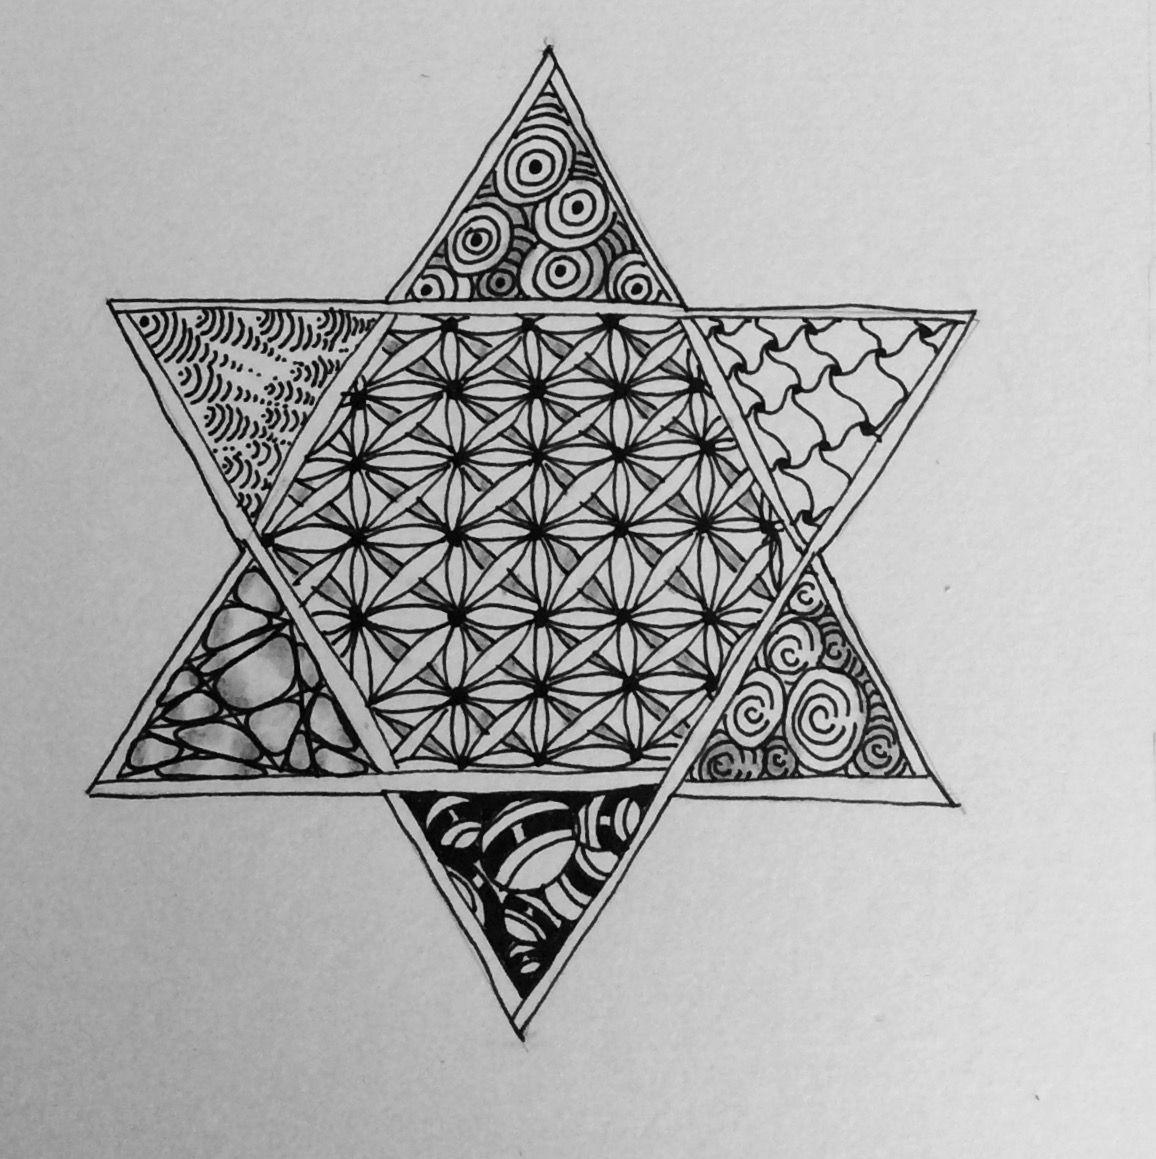 Star of David, ZIA, Zentangle Inspired Art Geometric